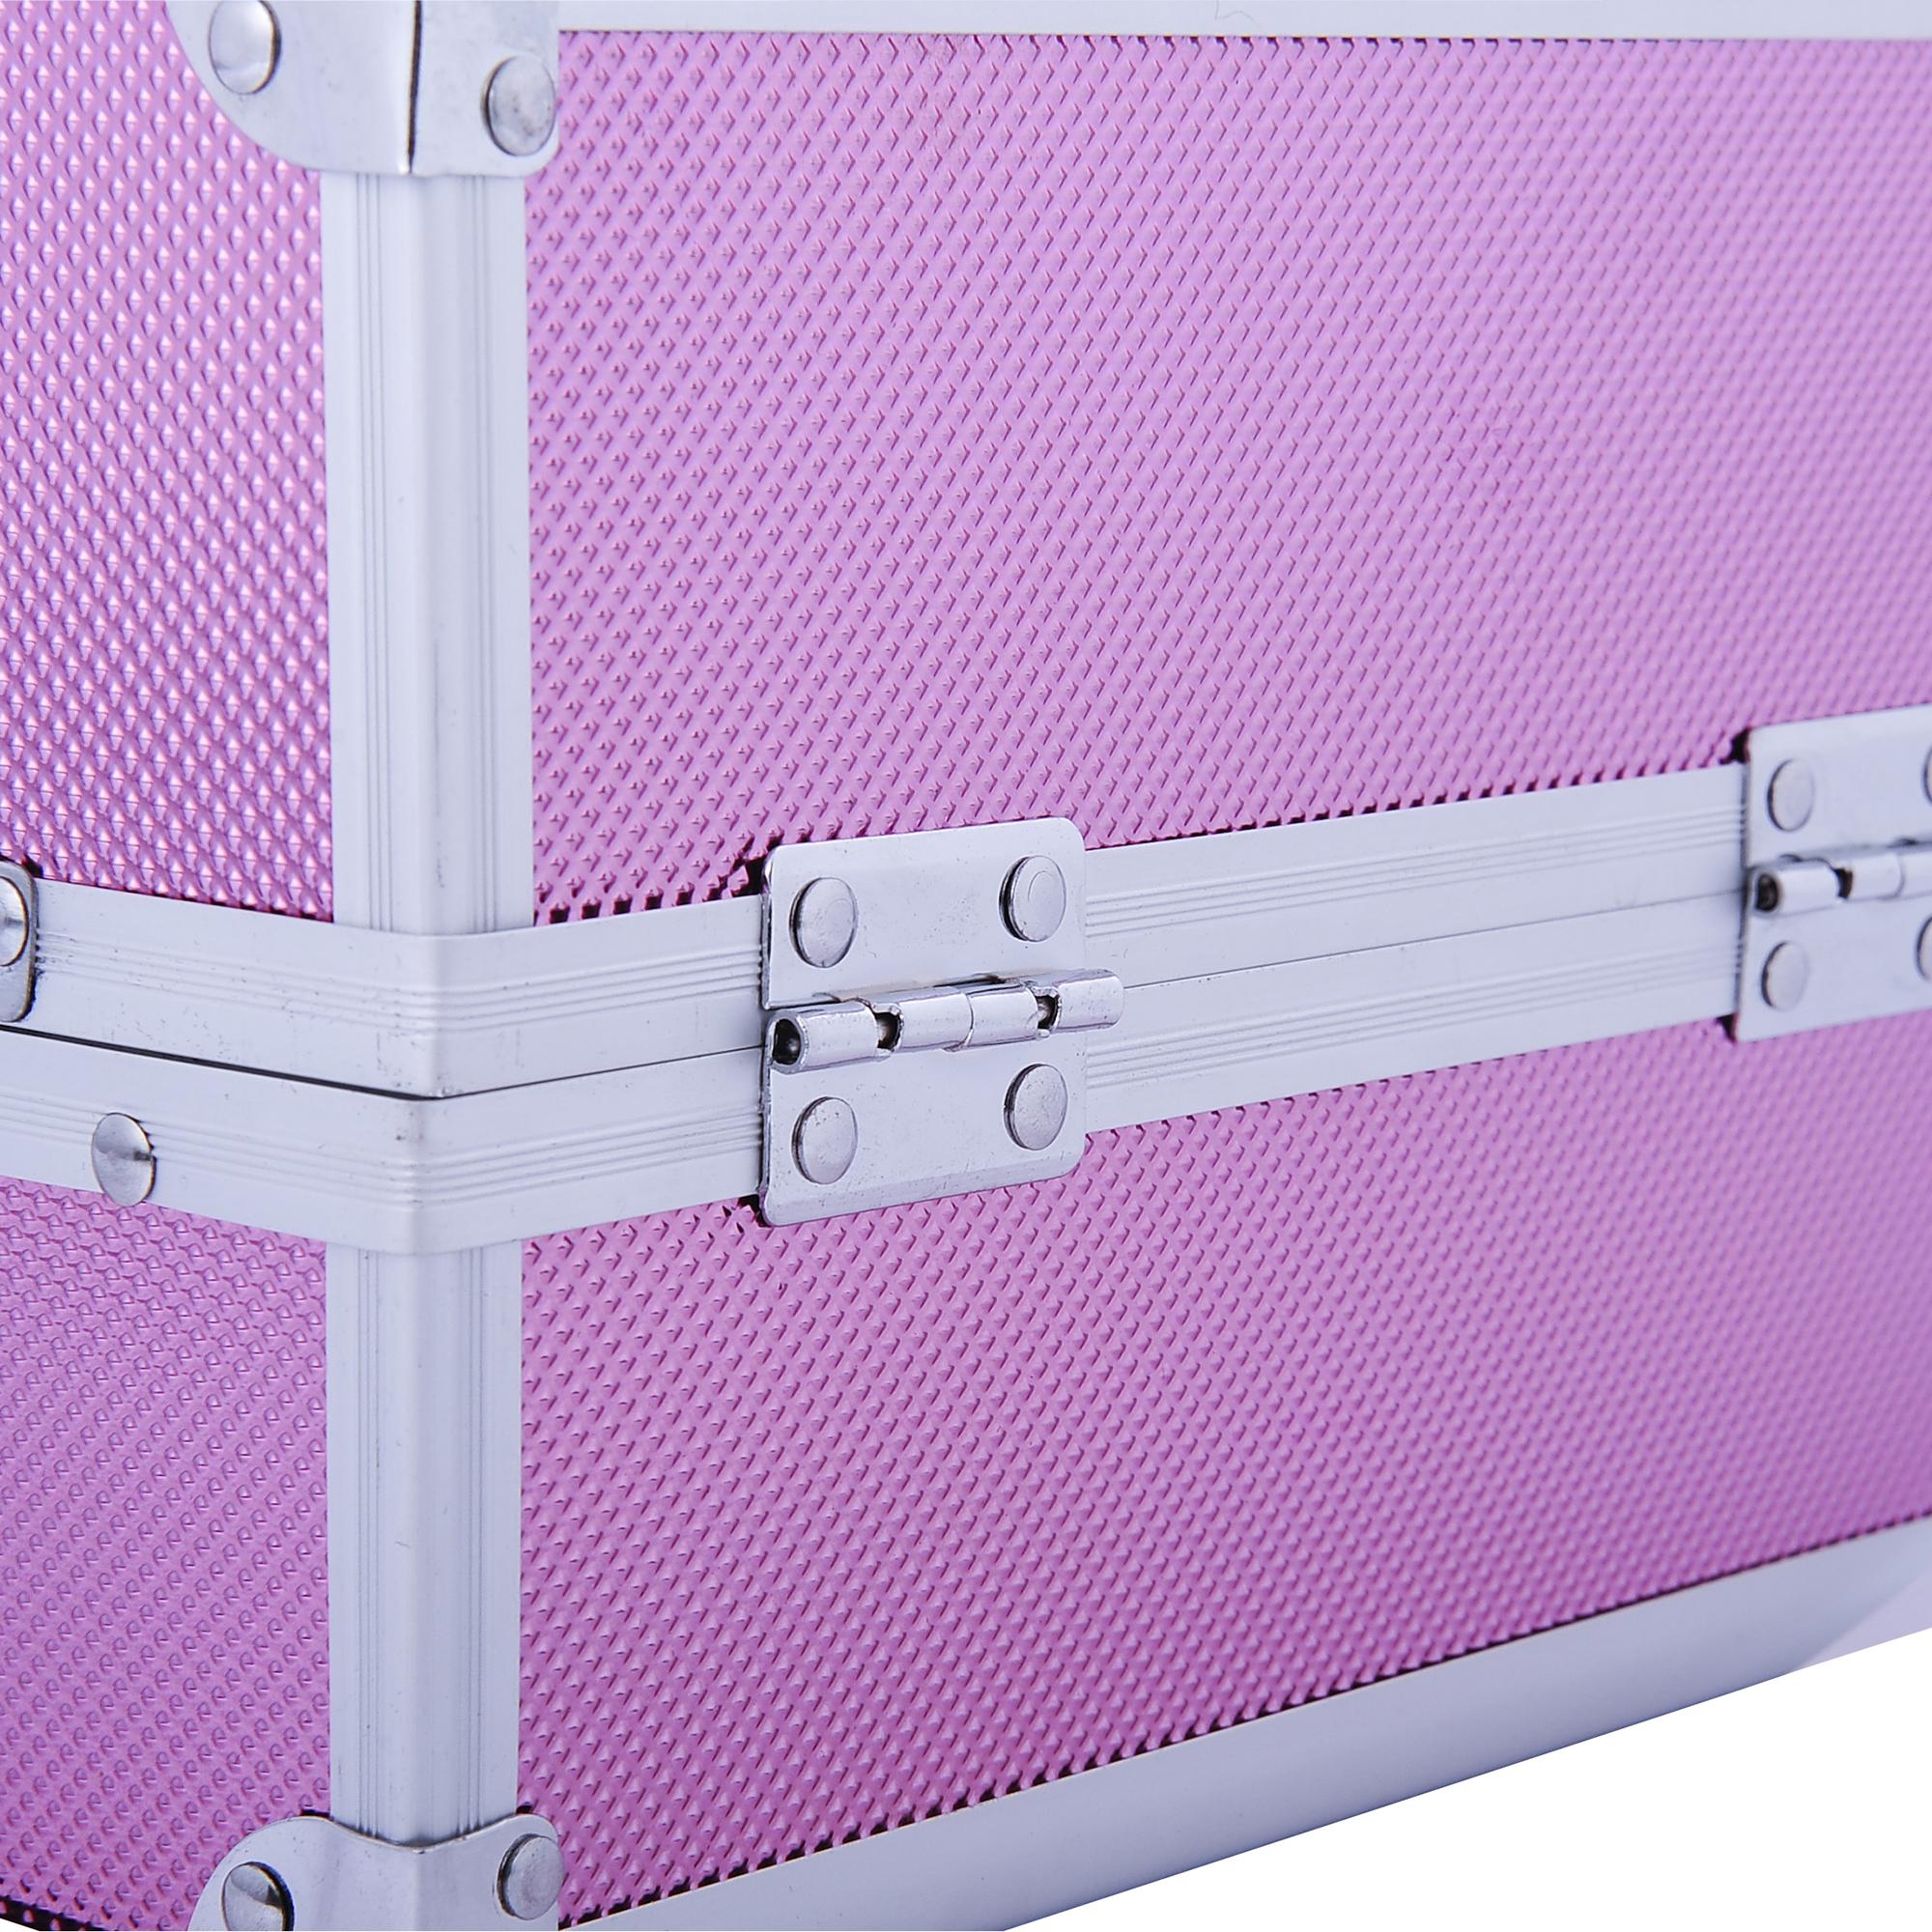 Aluminum-Rolling-Makeup-Train-Case-Trolley-Organizer-Storage-Box-Lockable thumbnail 38